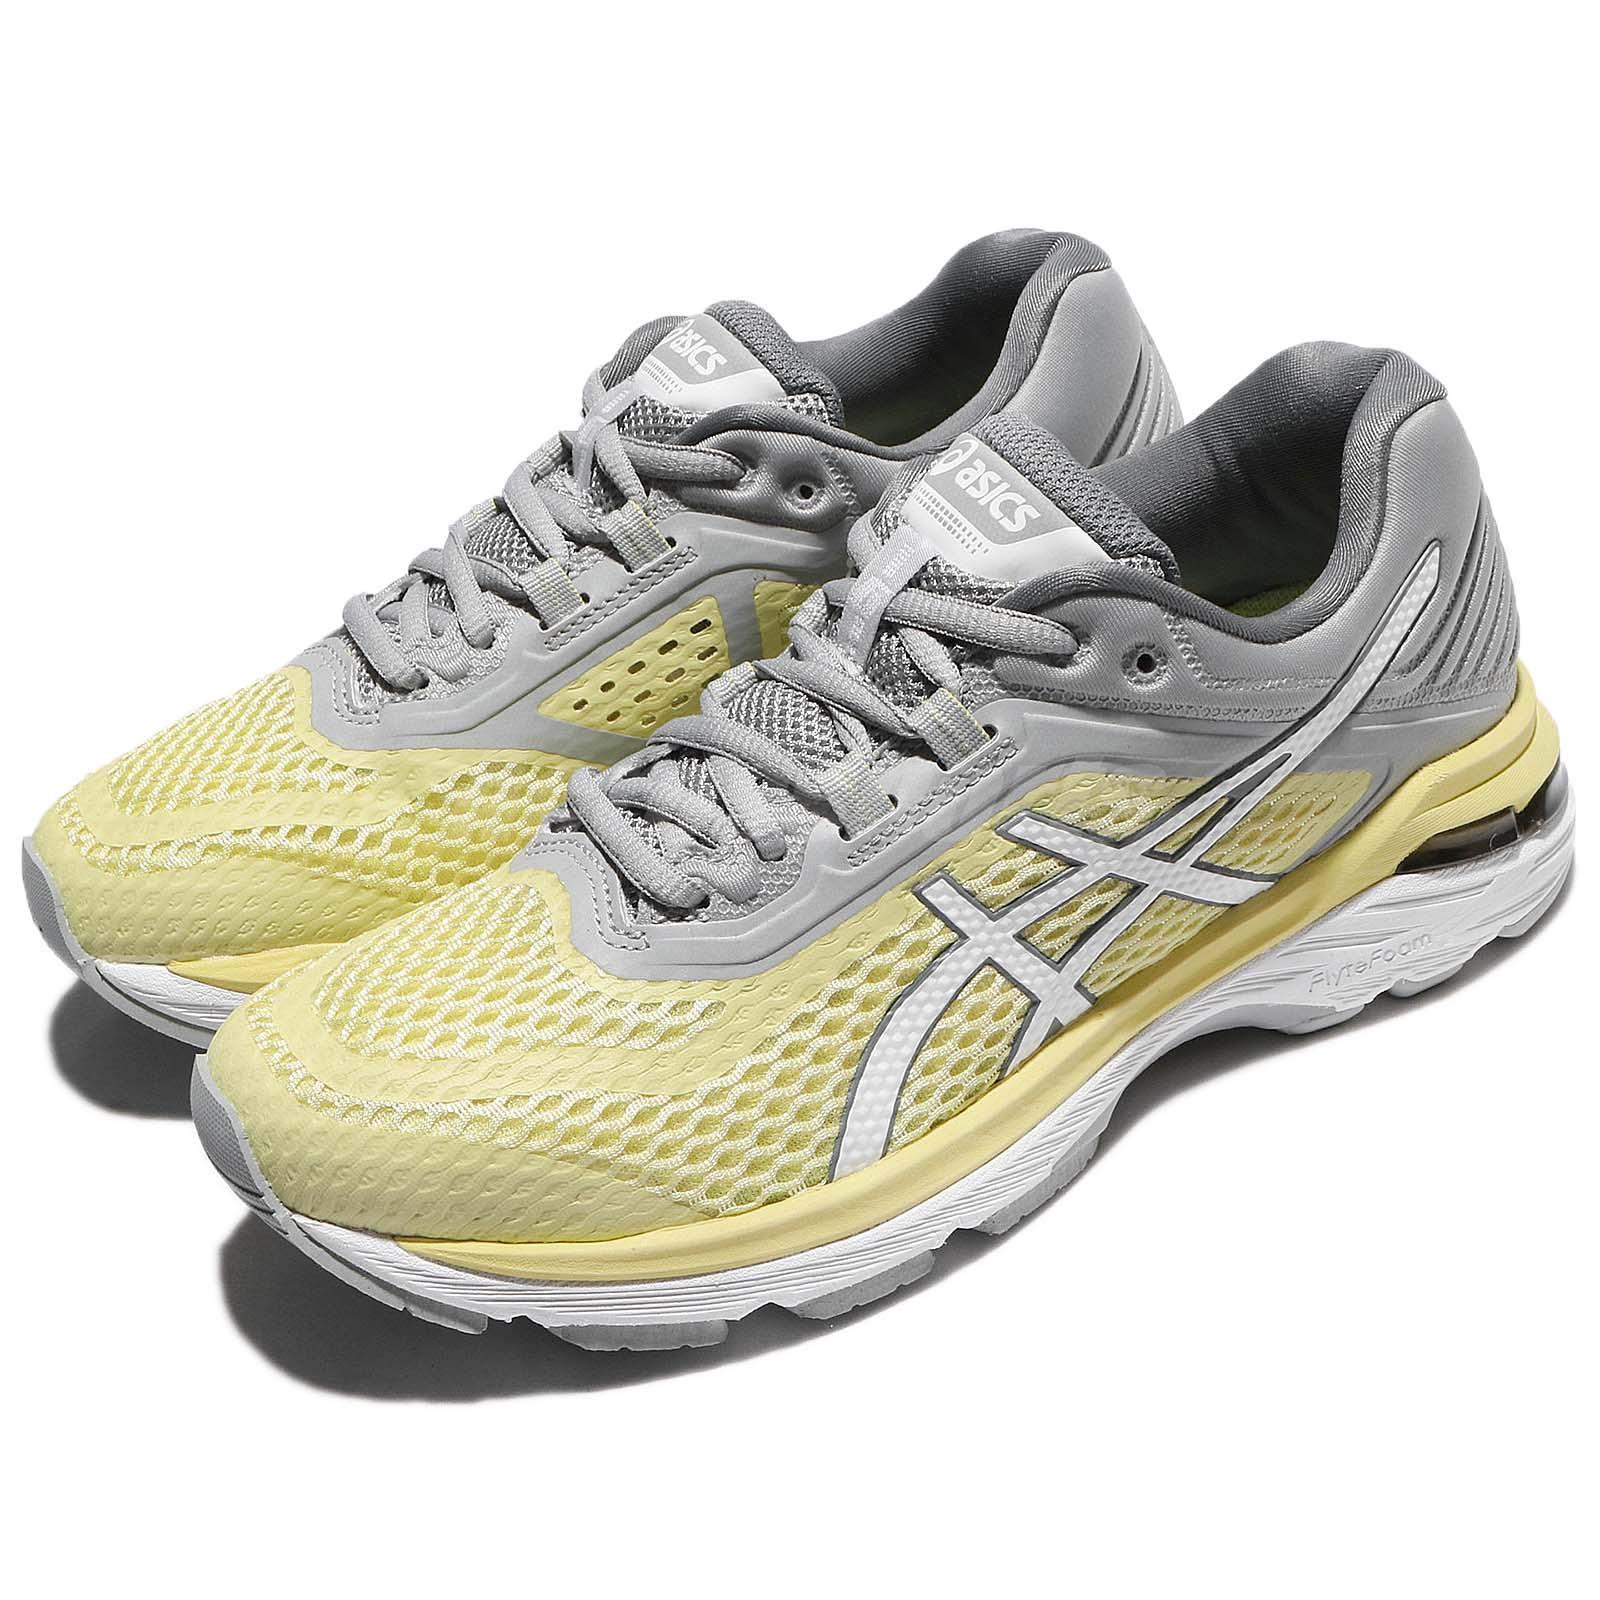 GT 2000 6 Road Running Shoes Women's